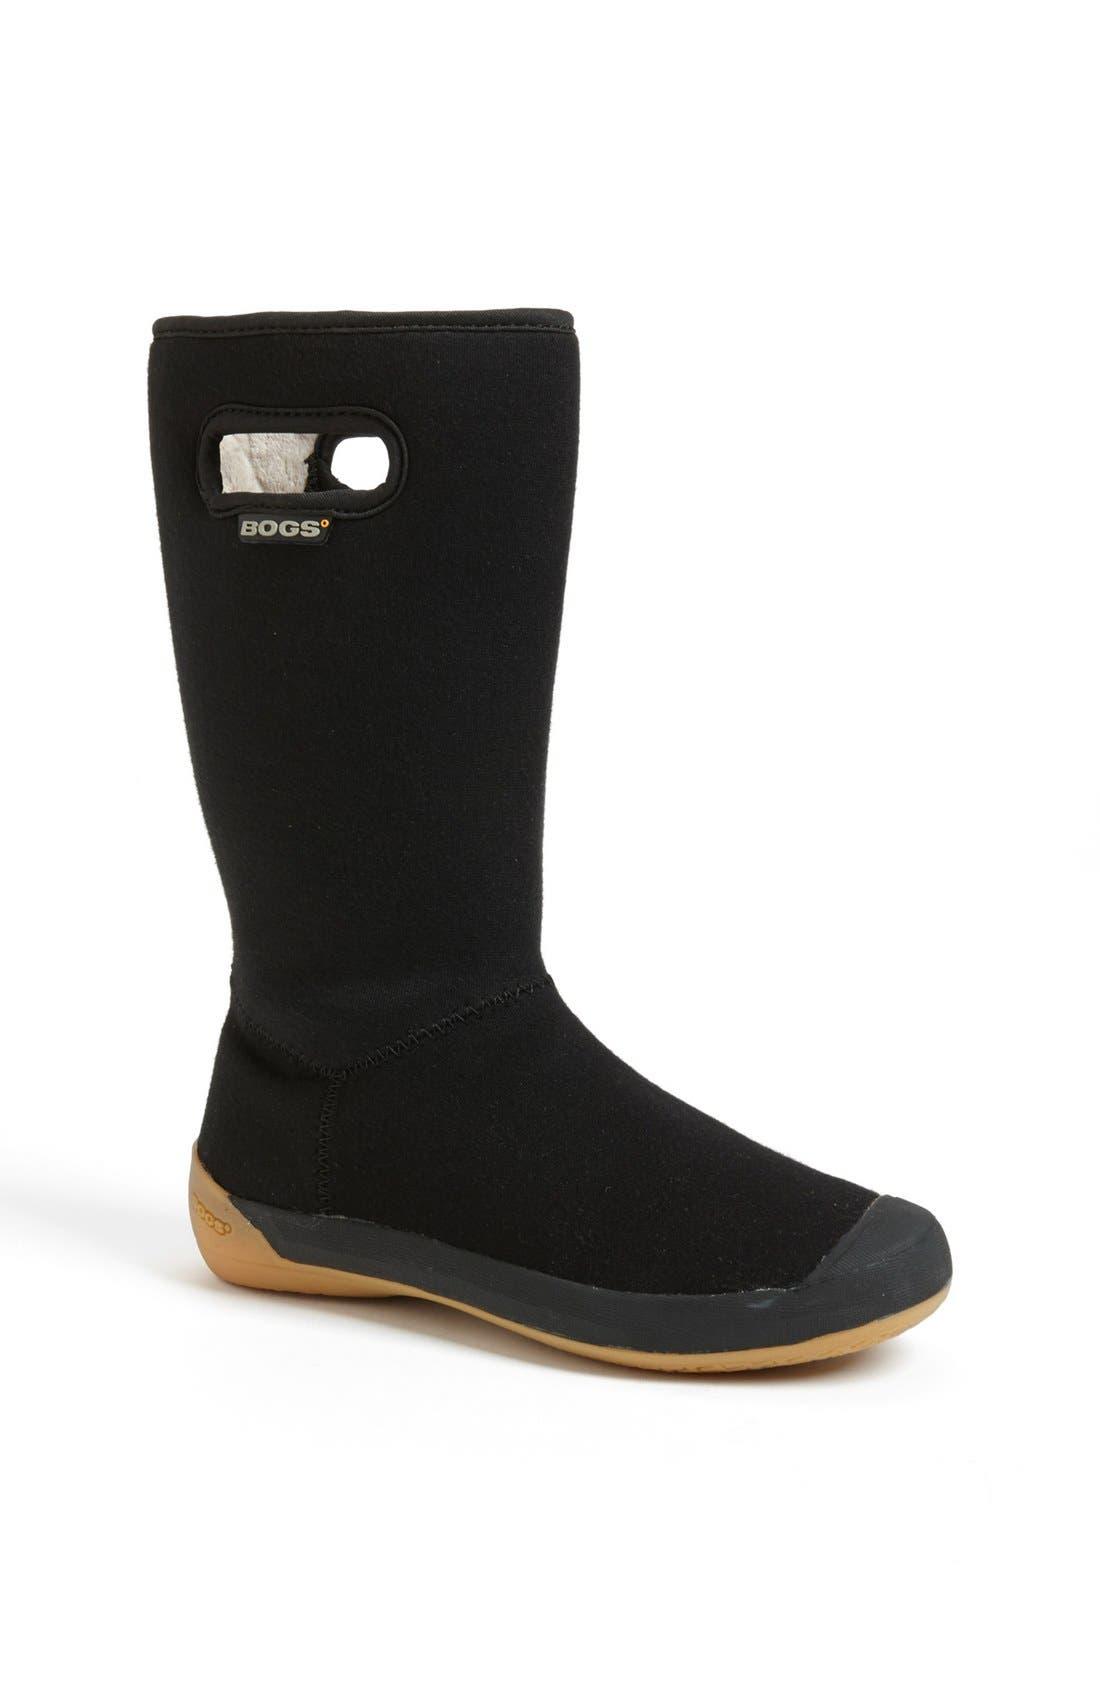 BOGS 'Summit' Waterproof Boot, Main, color, 001